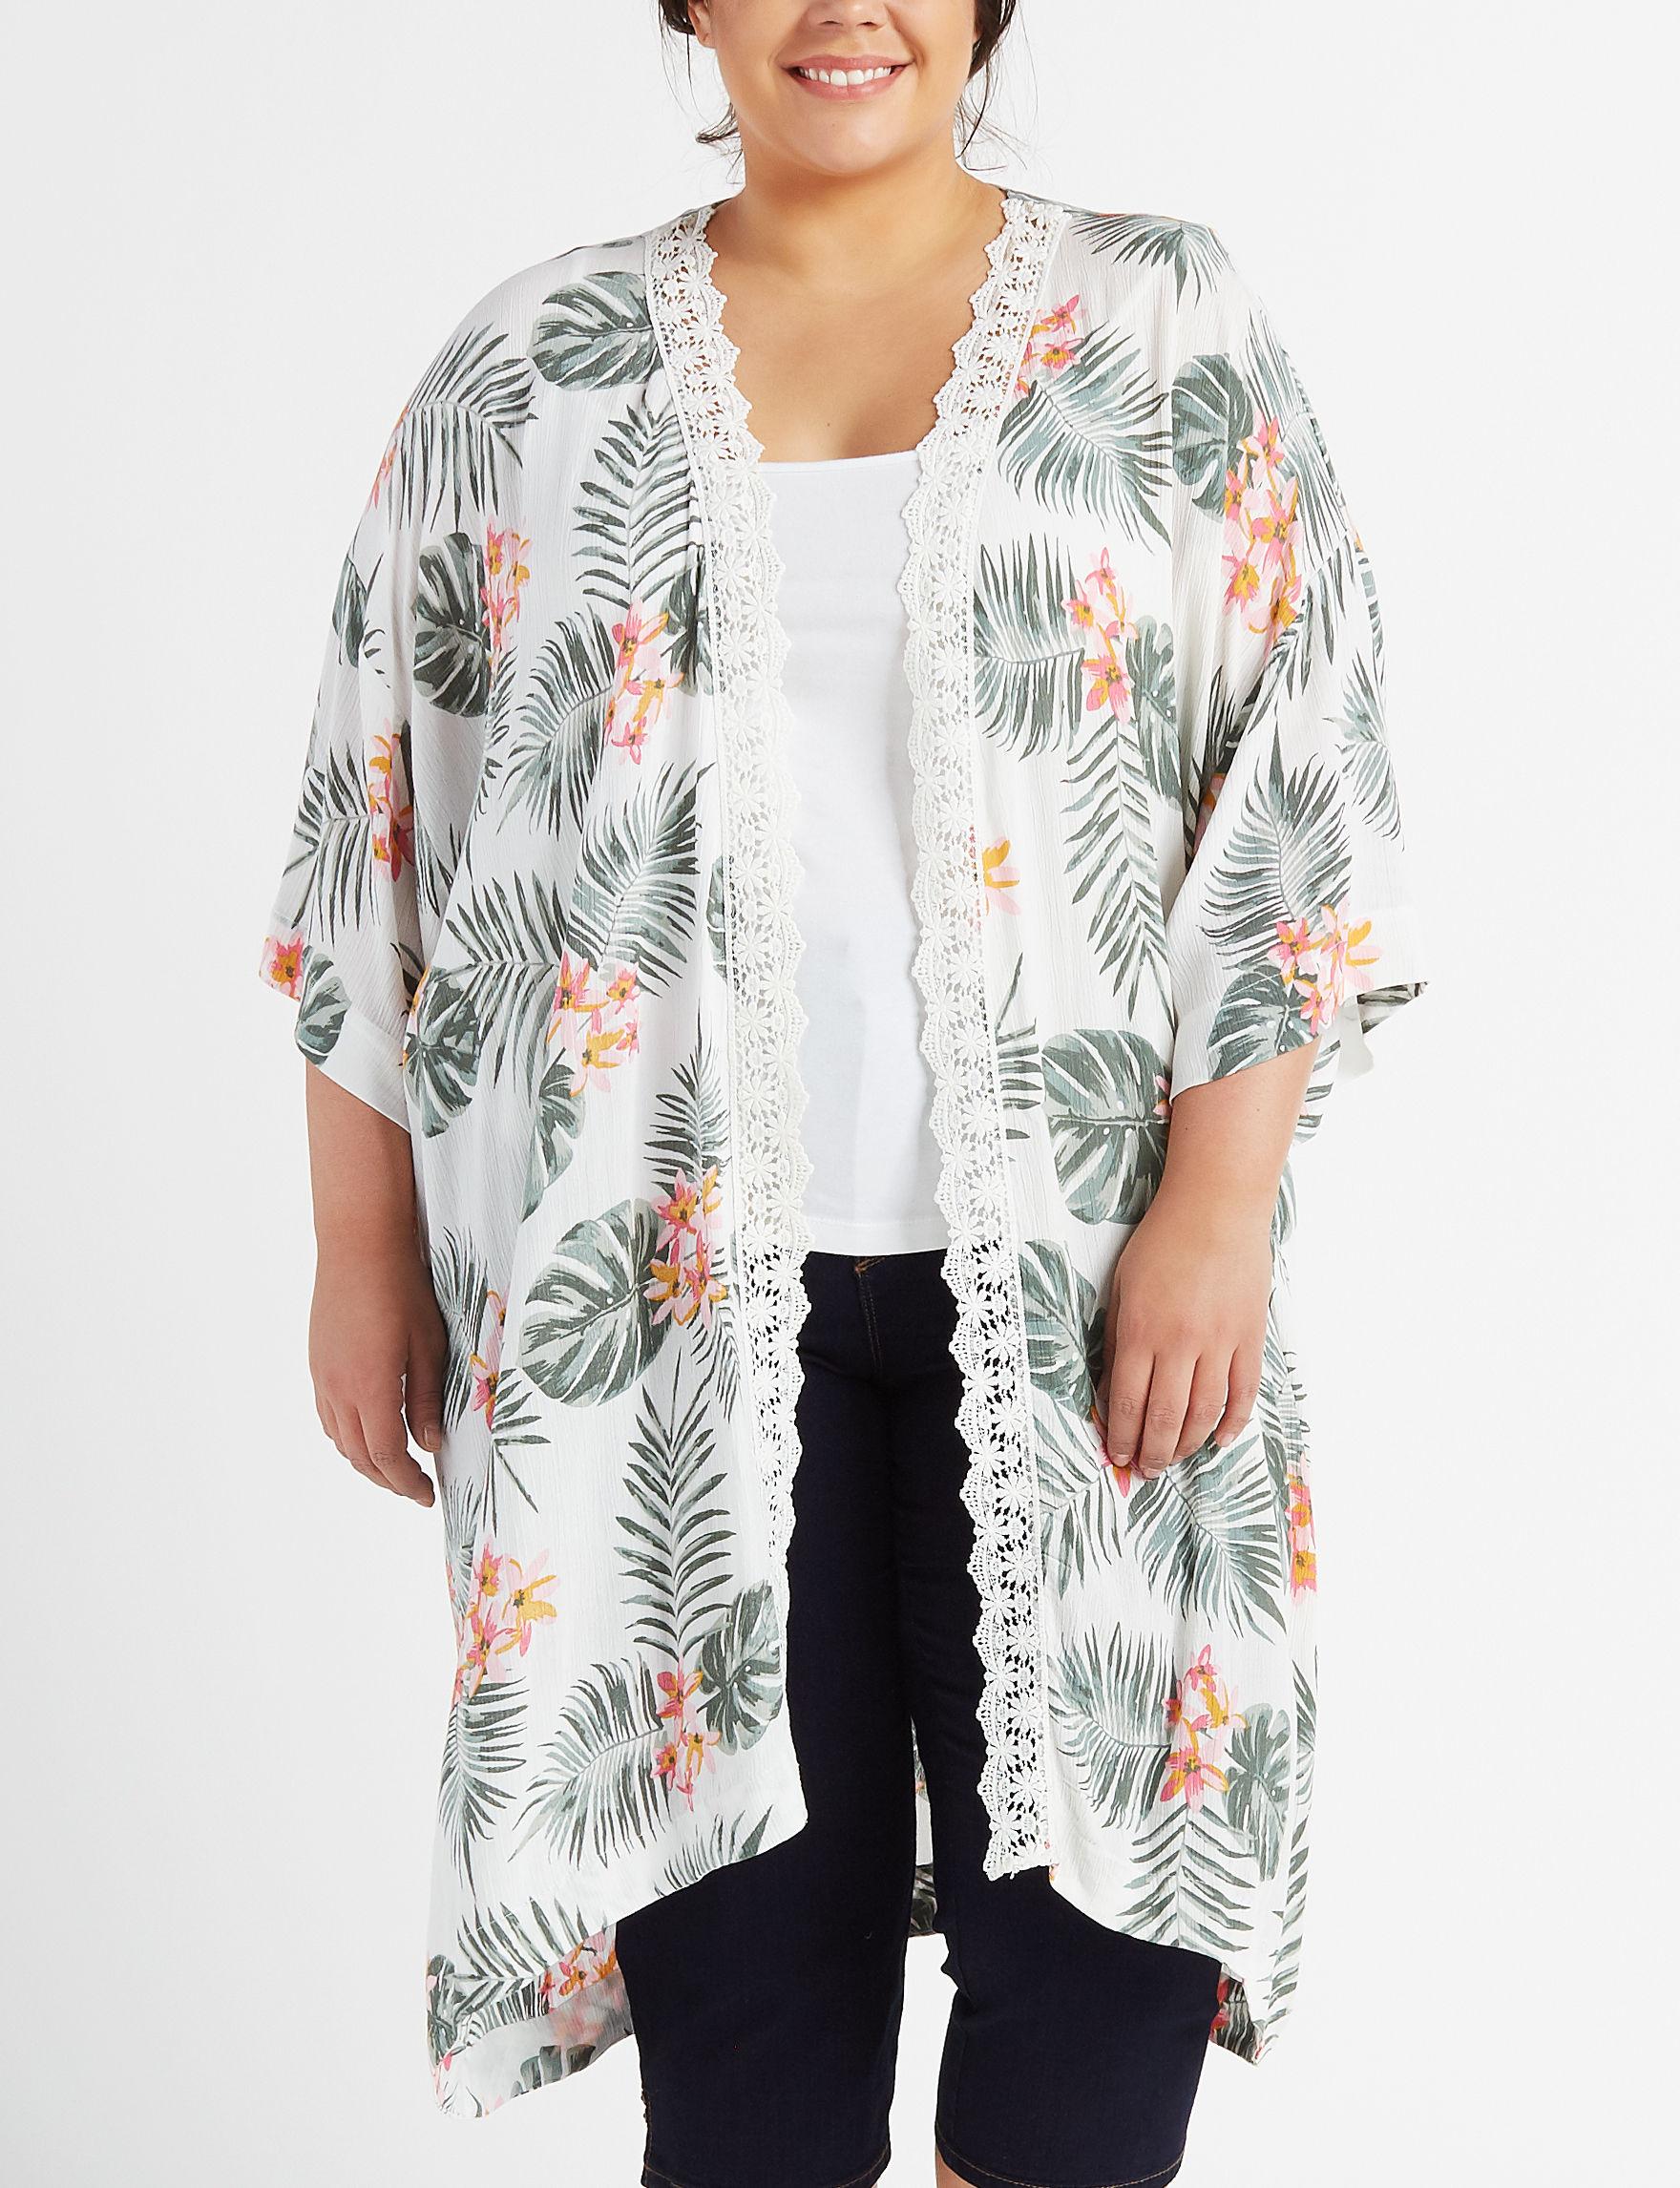 Moral Fiber Ivory Kimonos & Toppers